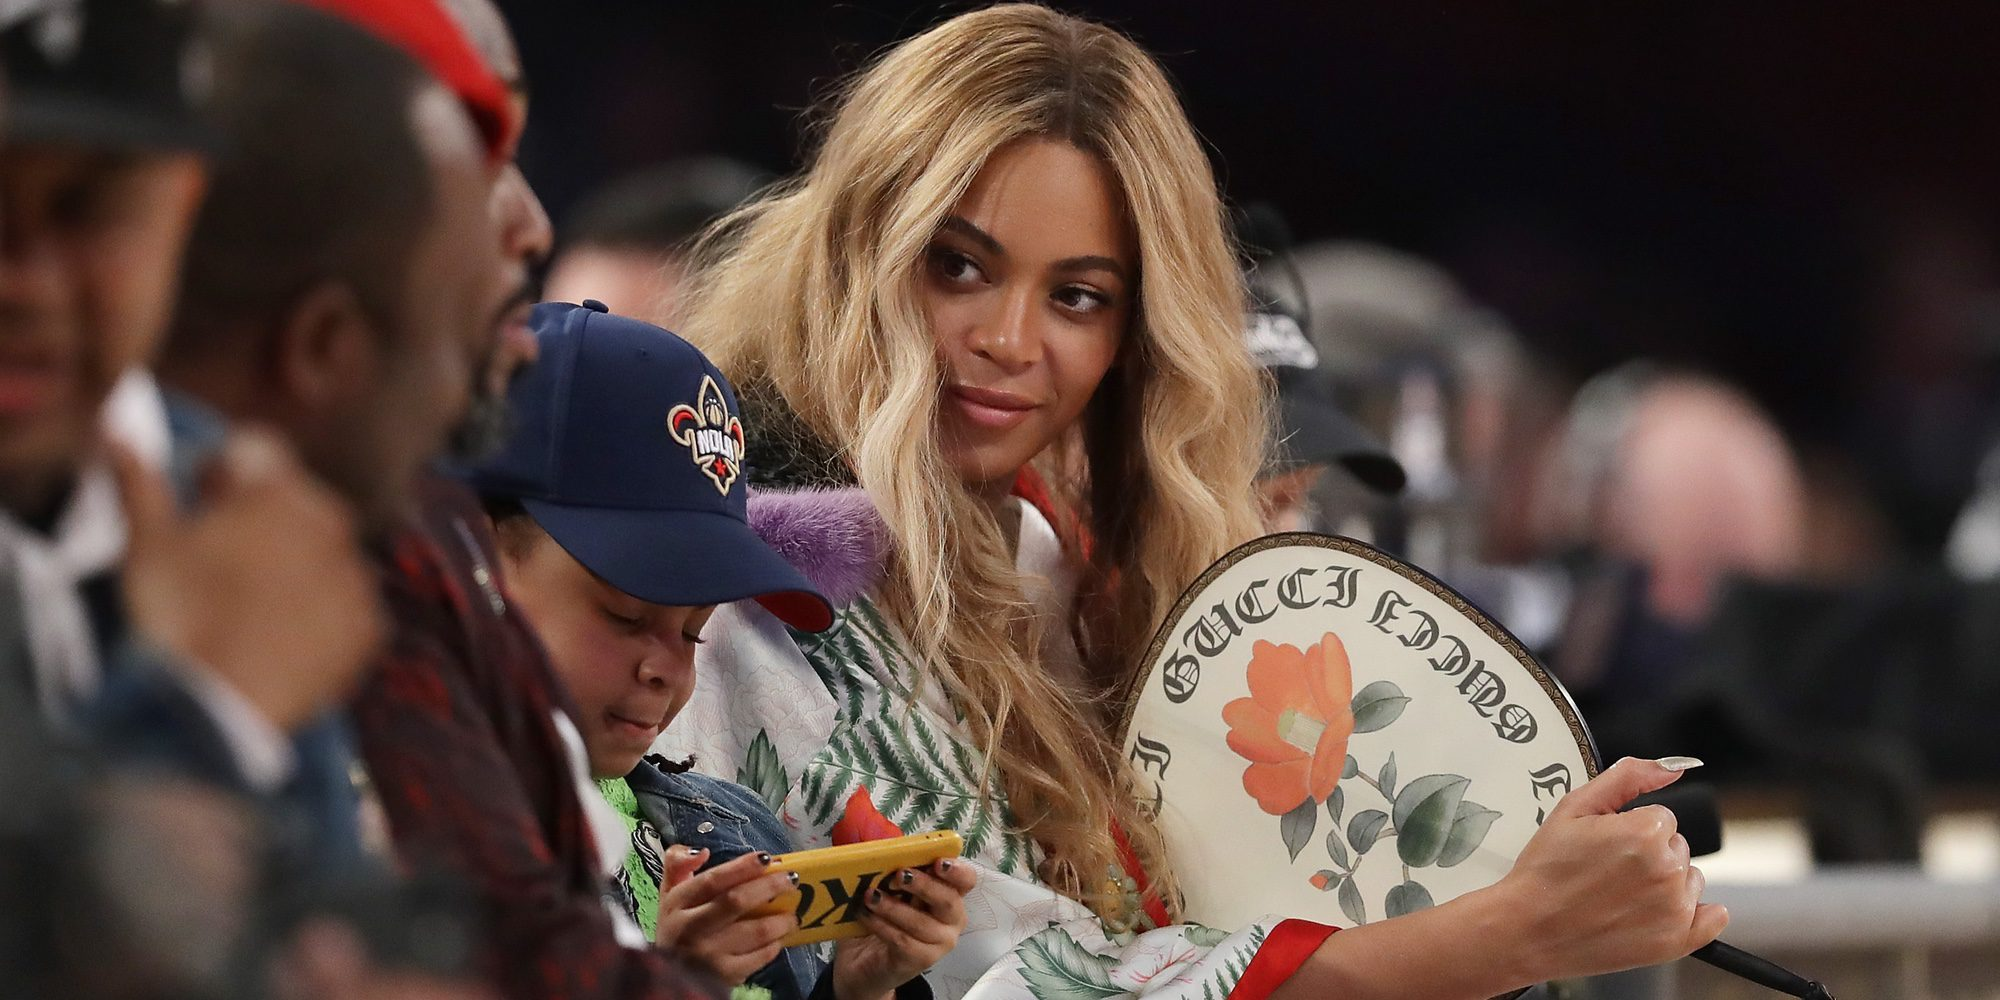 Beyoncé vuelve a lucir barriguita en una divertida sesión de fotos